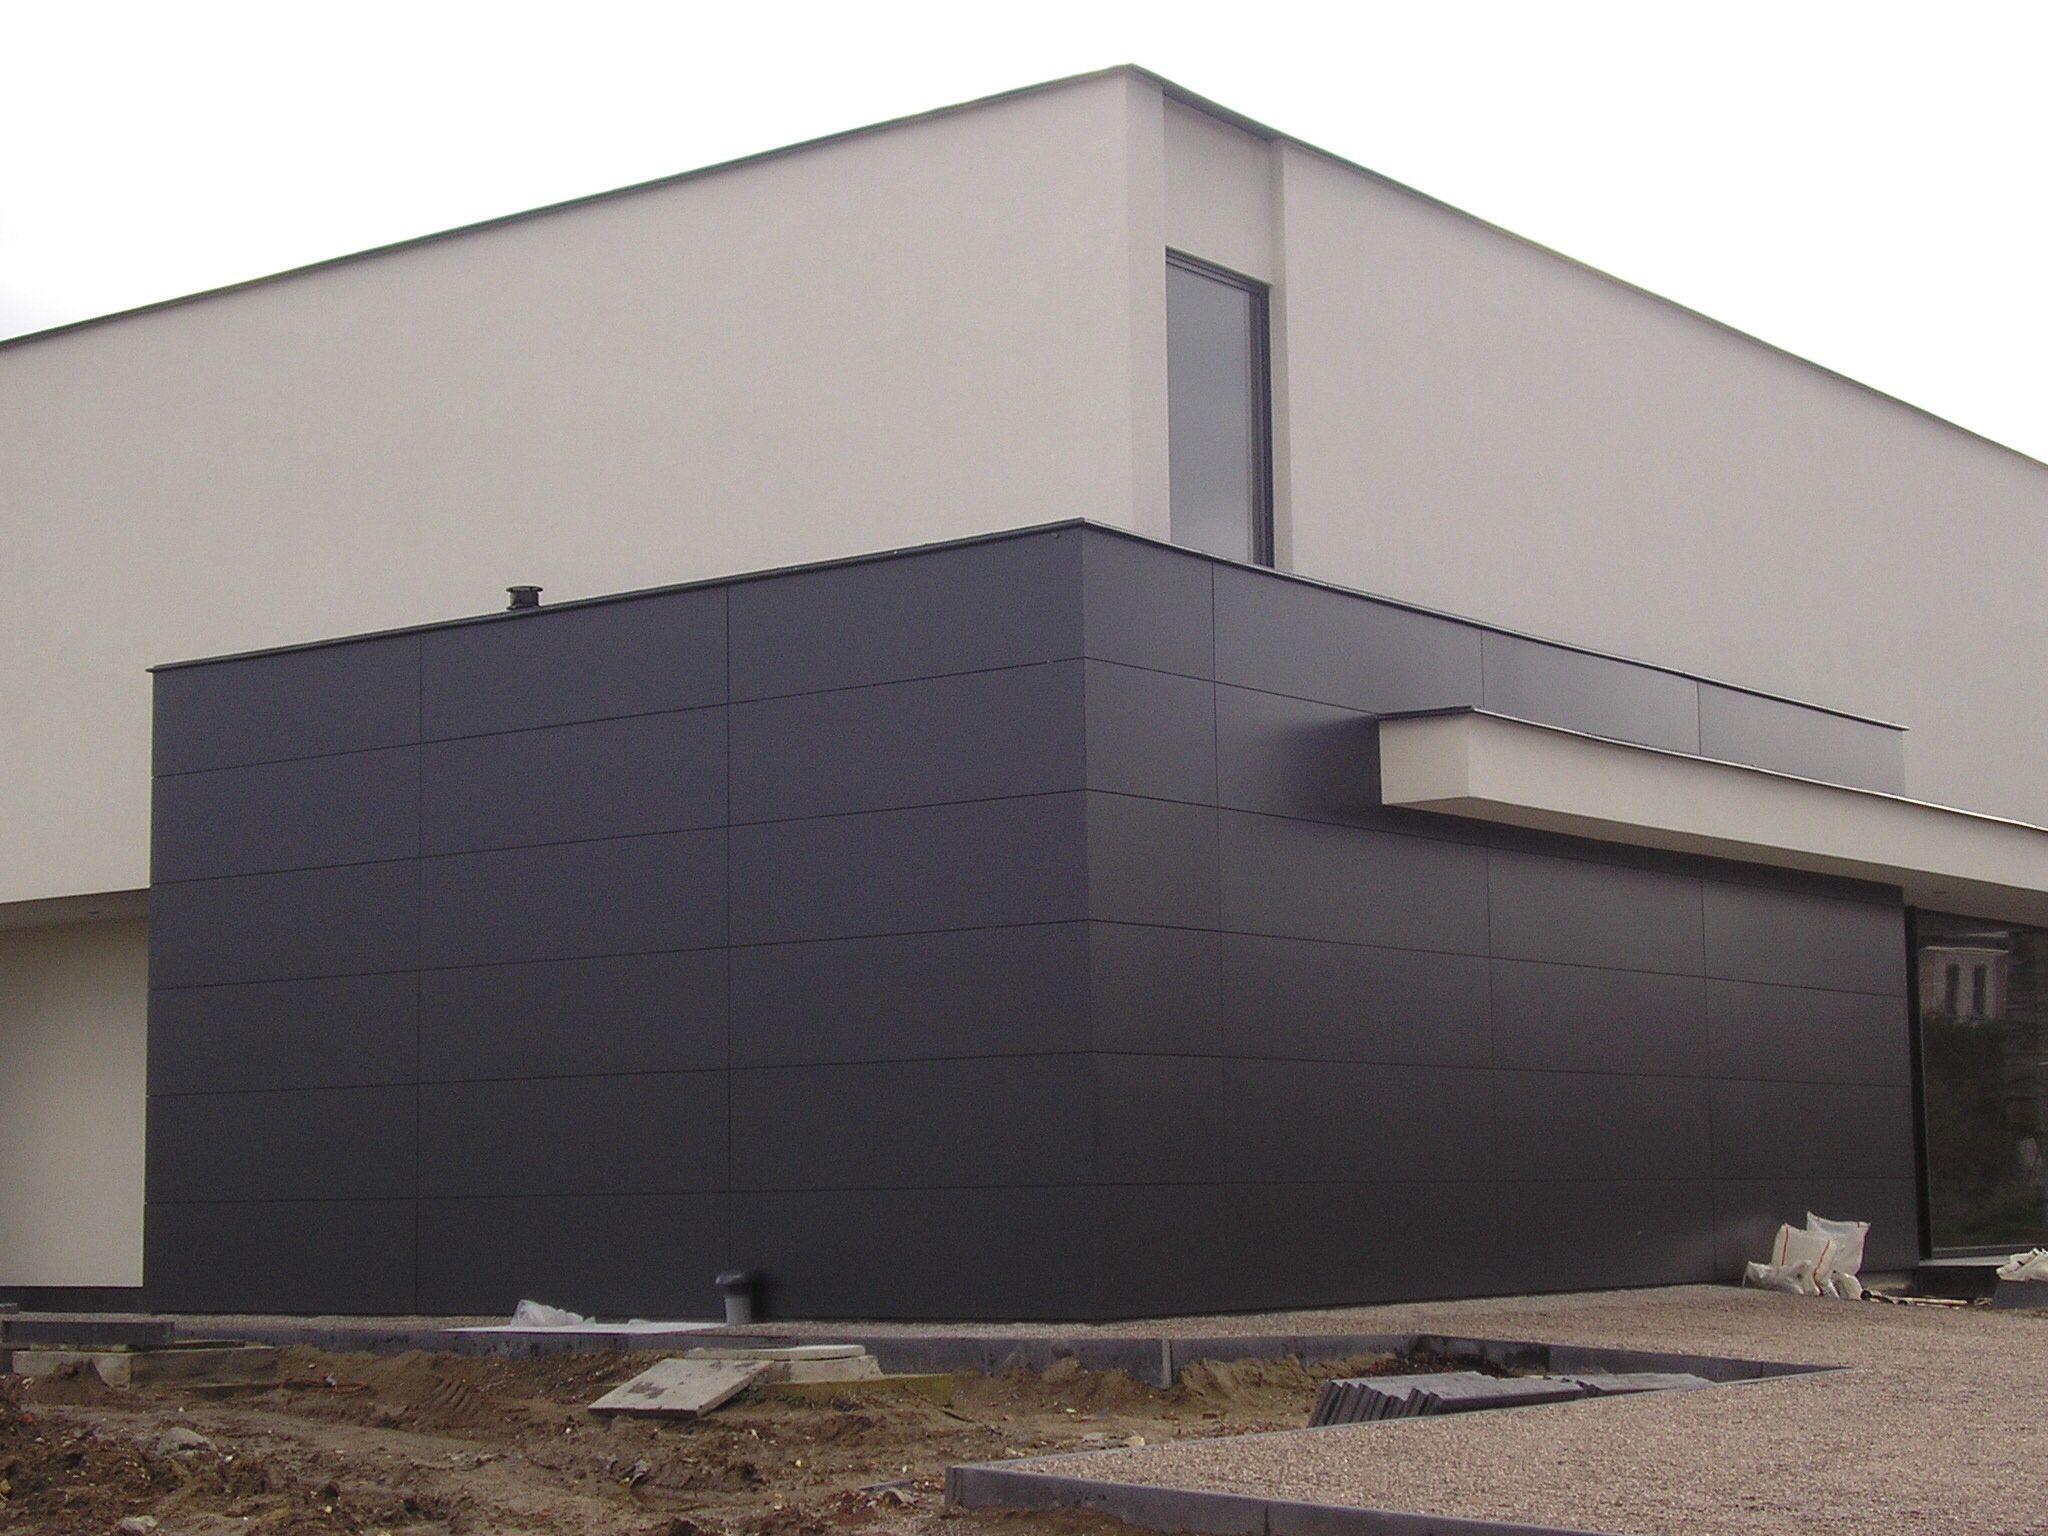 Garagentor Bauhaus Decotric Kg With Garagentor Bauhaus